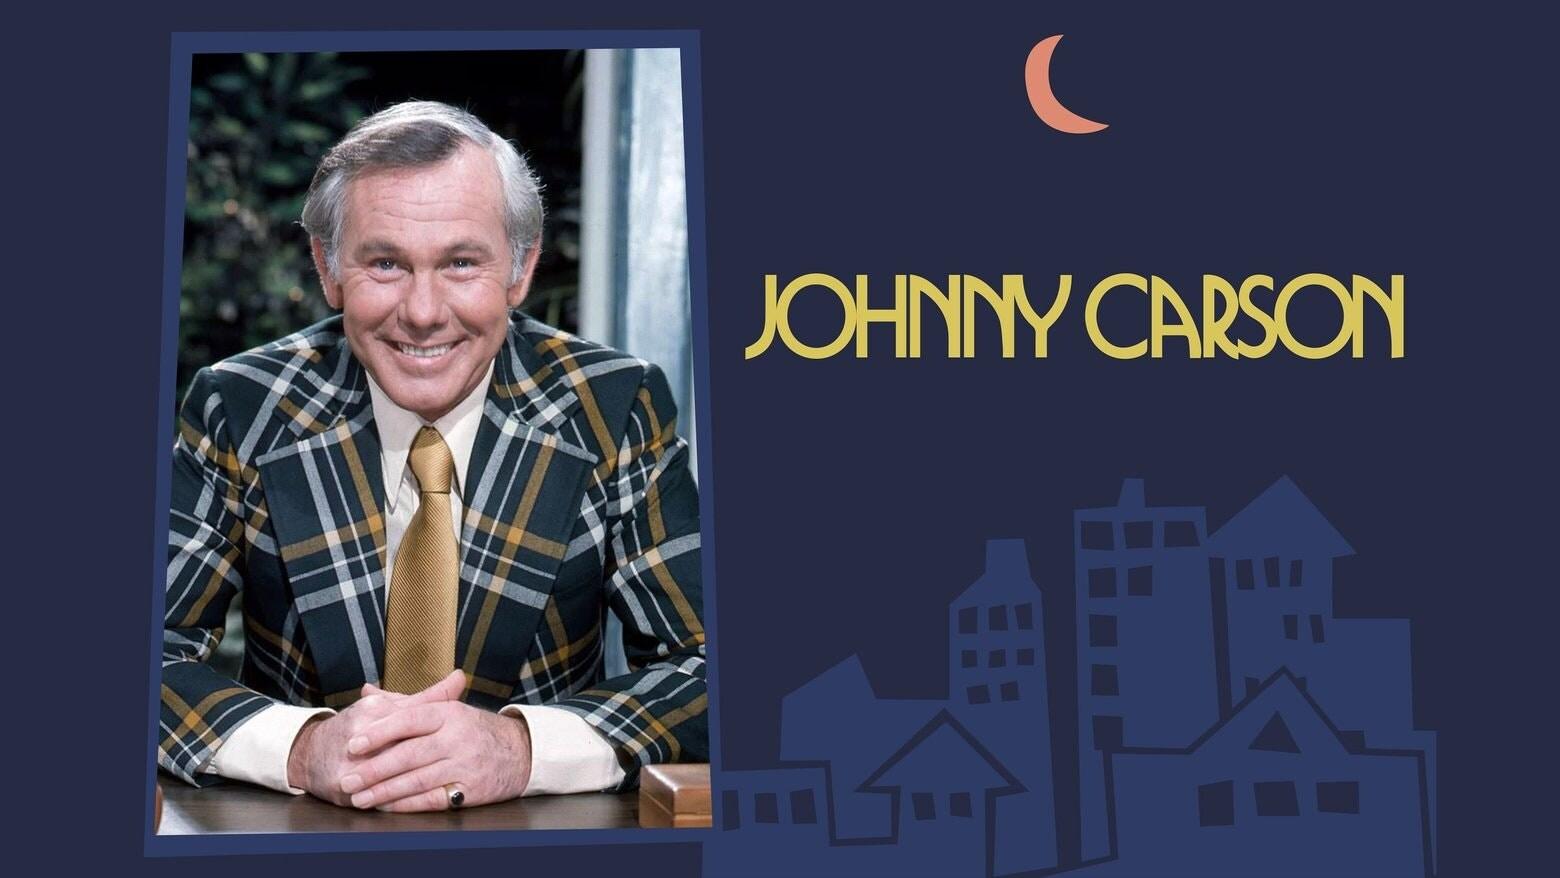 The Johnny Carson Show: Animal Antics With Joan Embery (8/25/87)